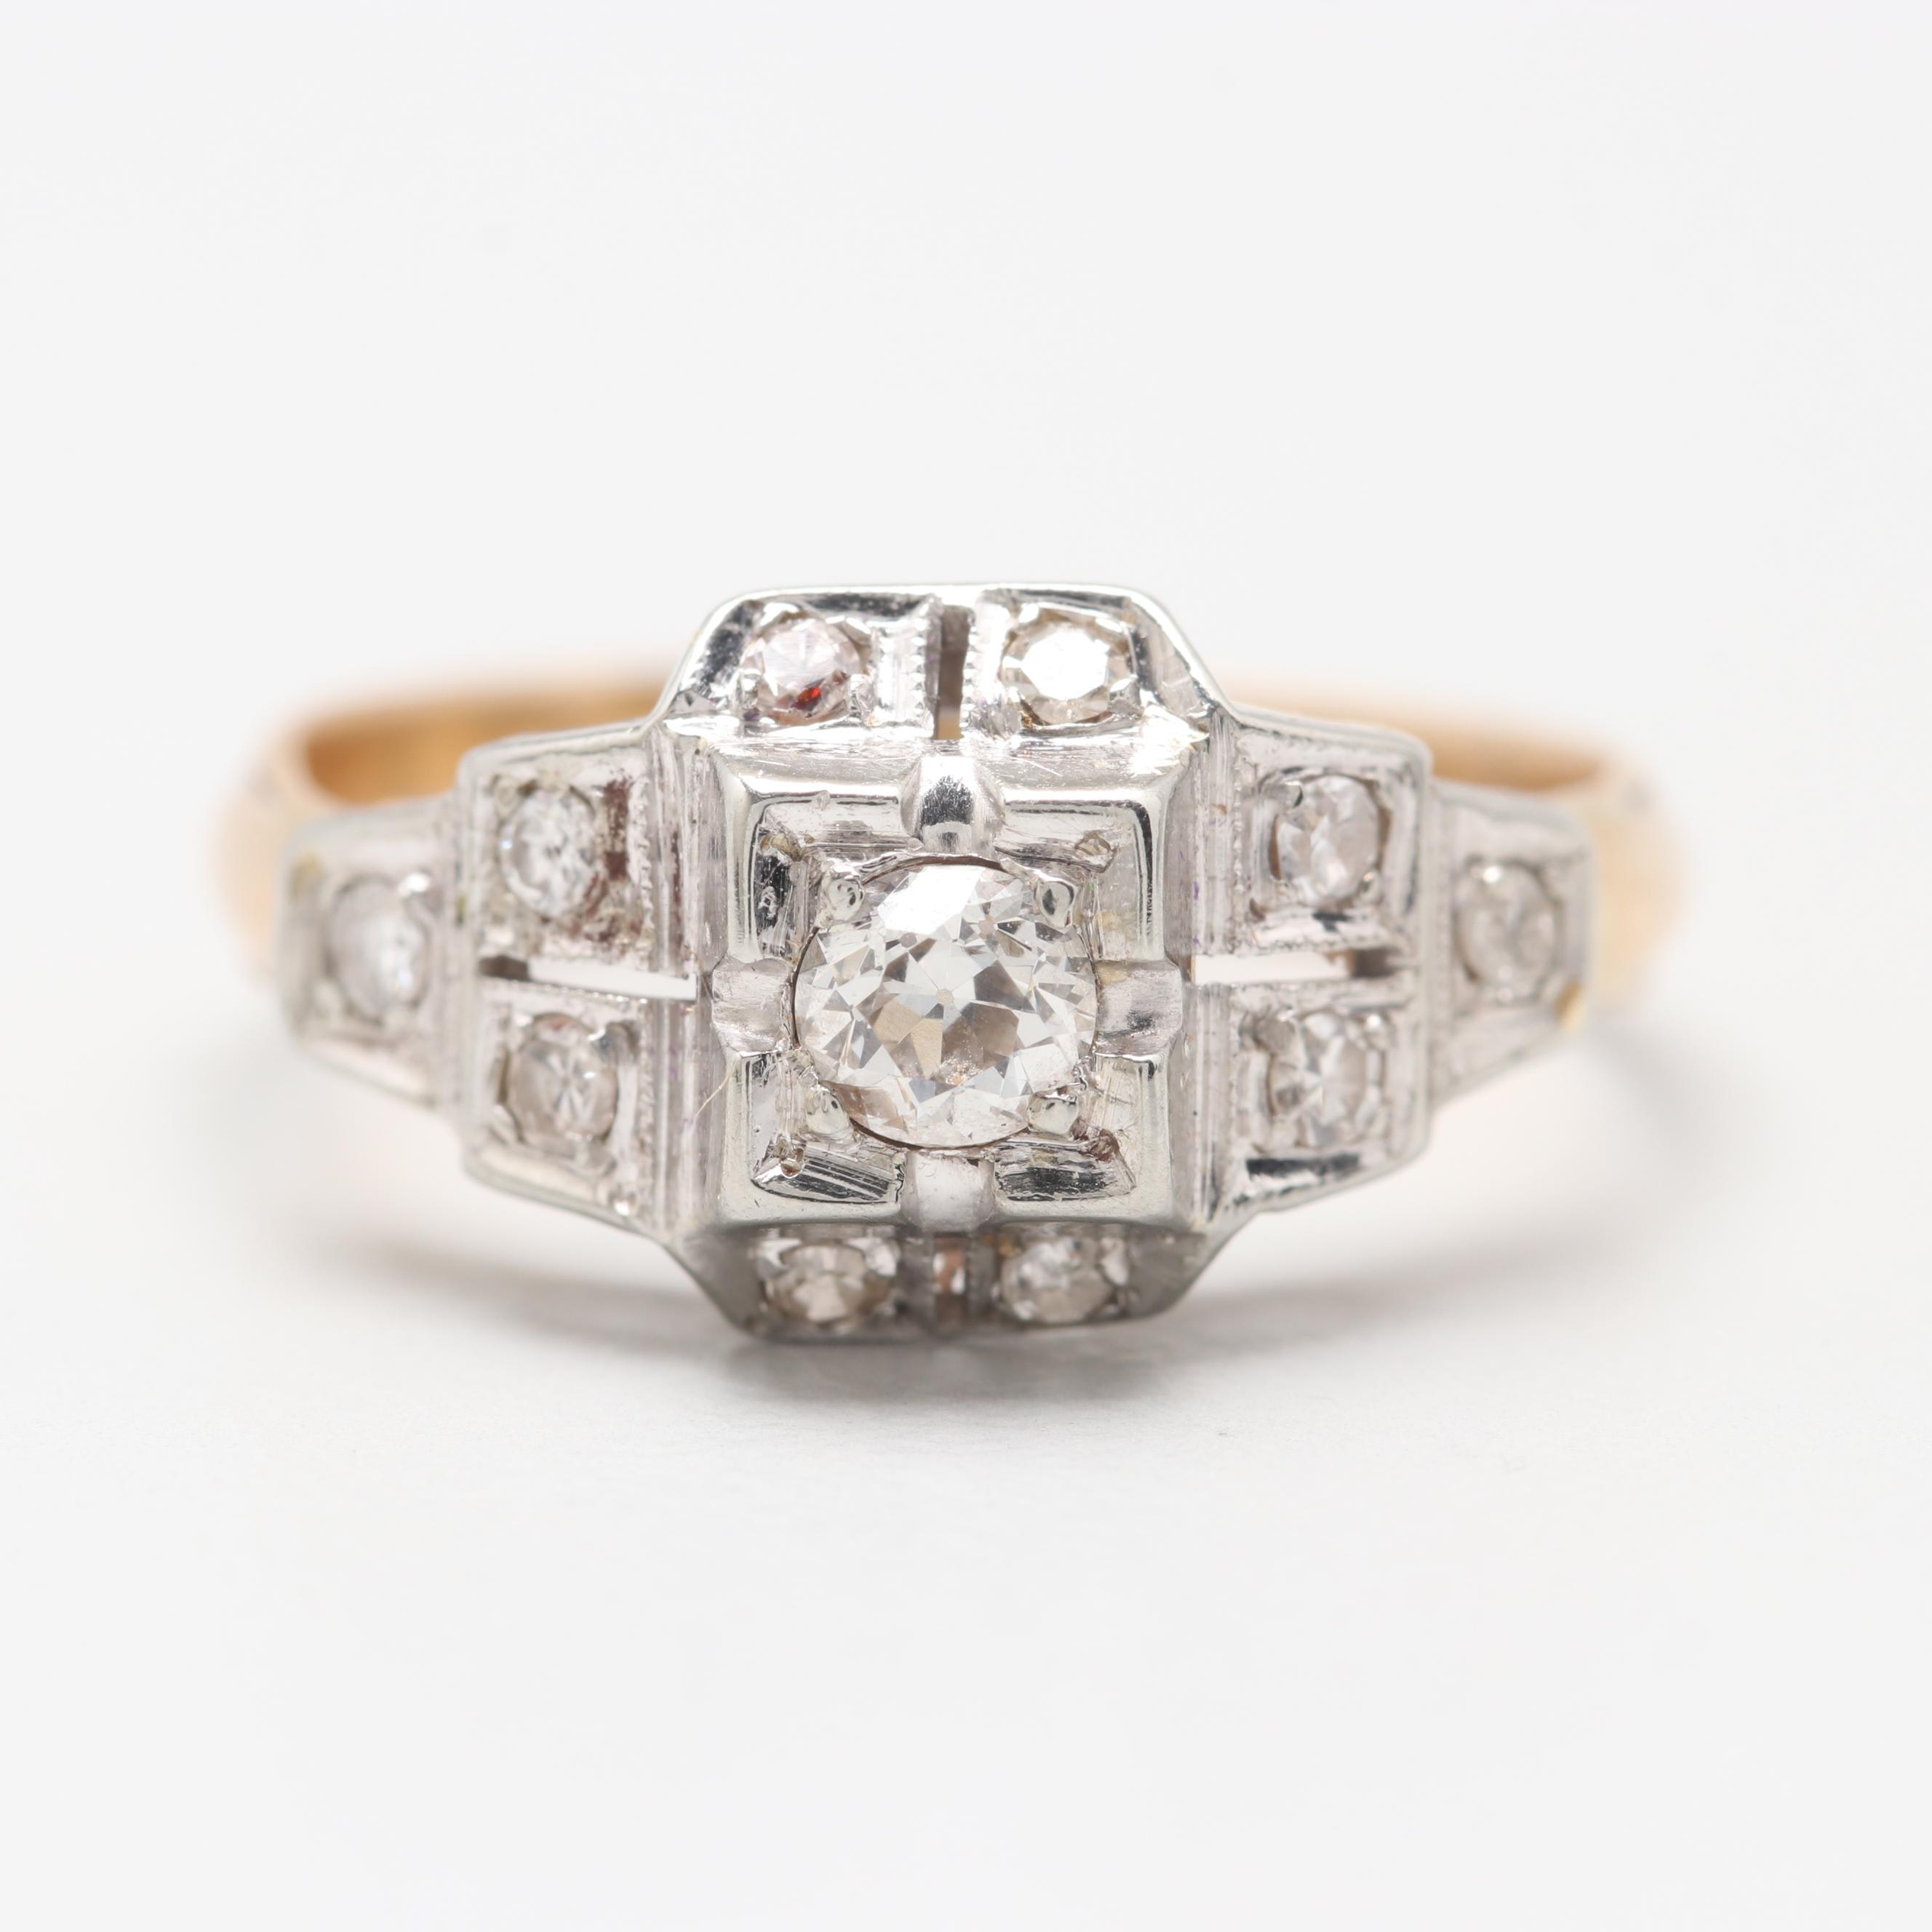 14K Yellow and White Gold Old European Cut Diamond Ring